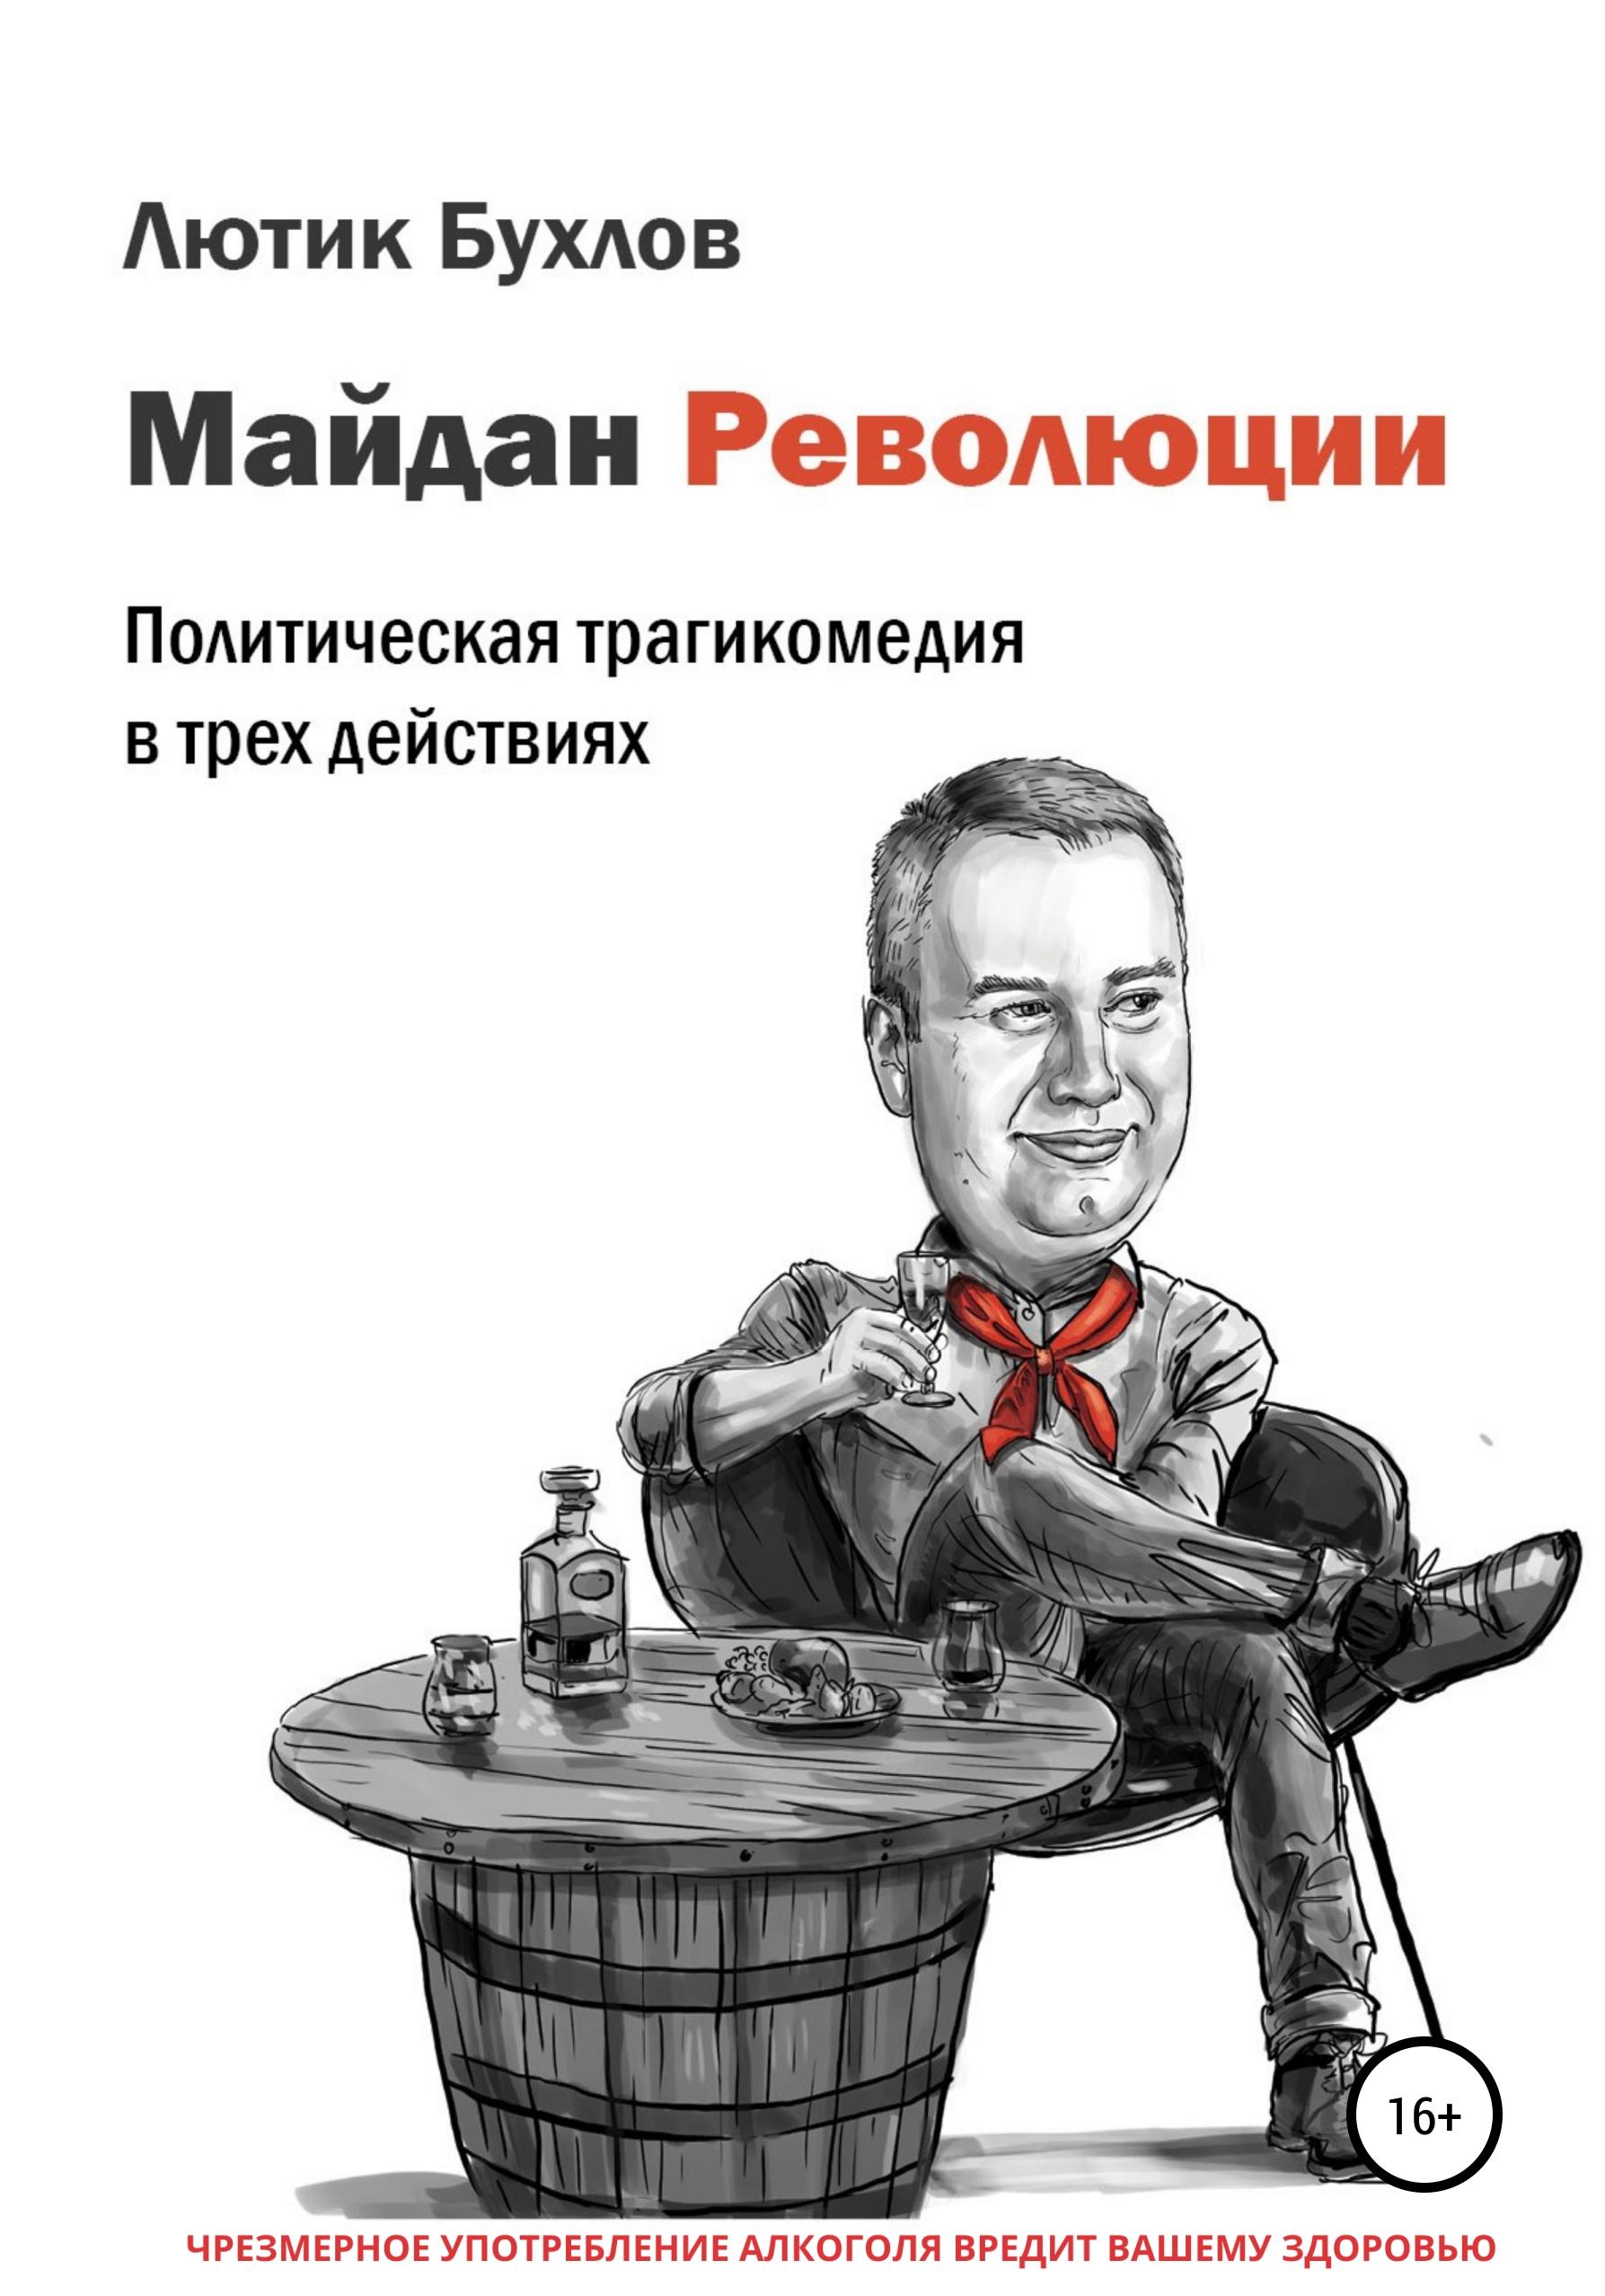 Лютик Бухлов - Майдан Революции